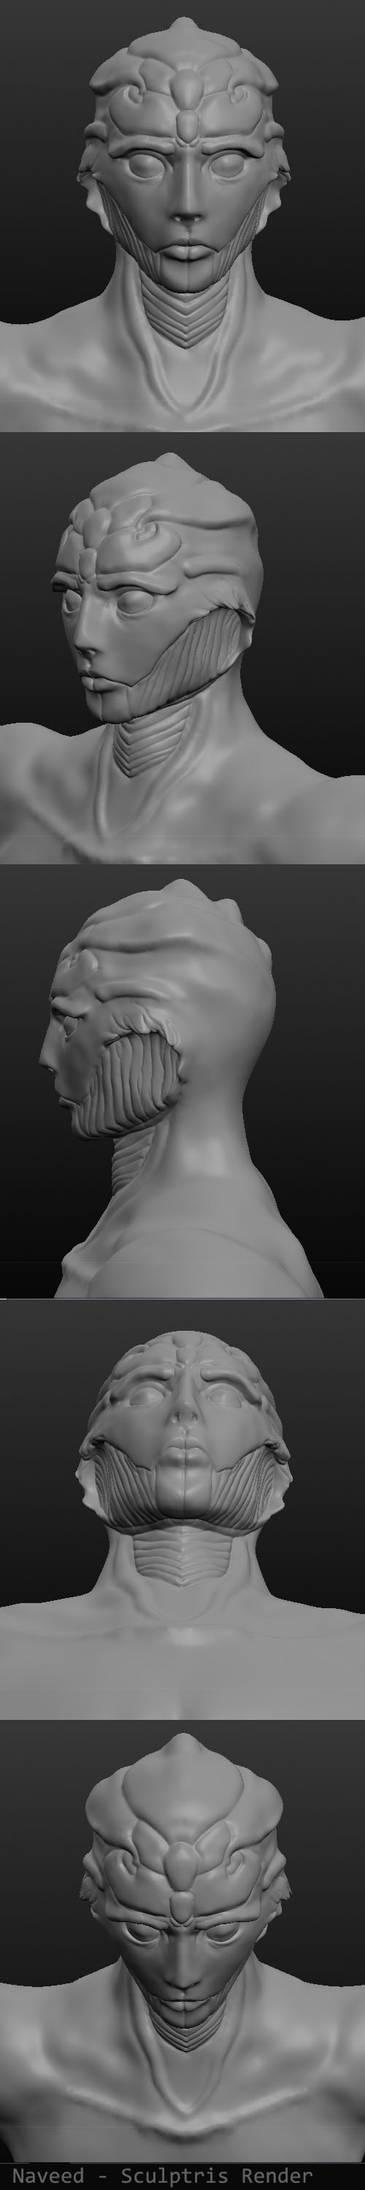 Naveed Face Sculpt